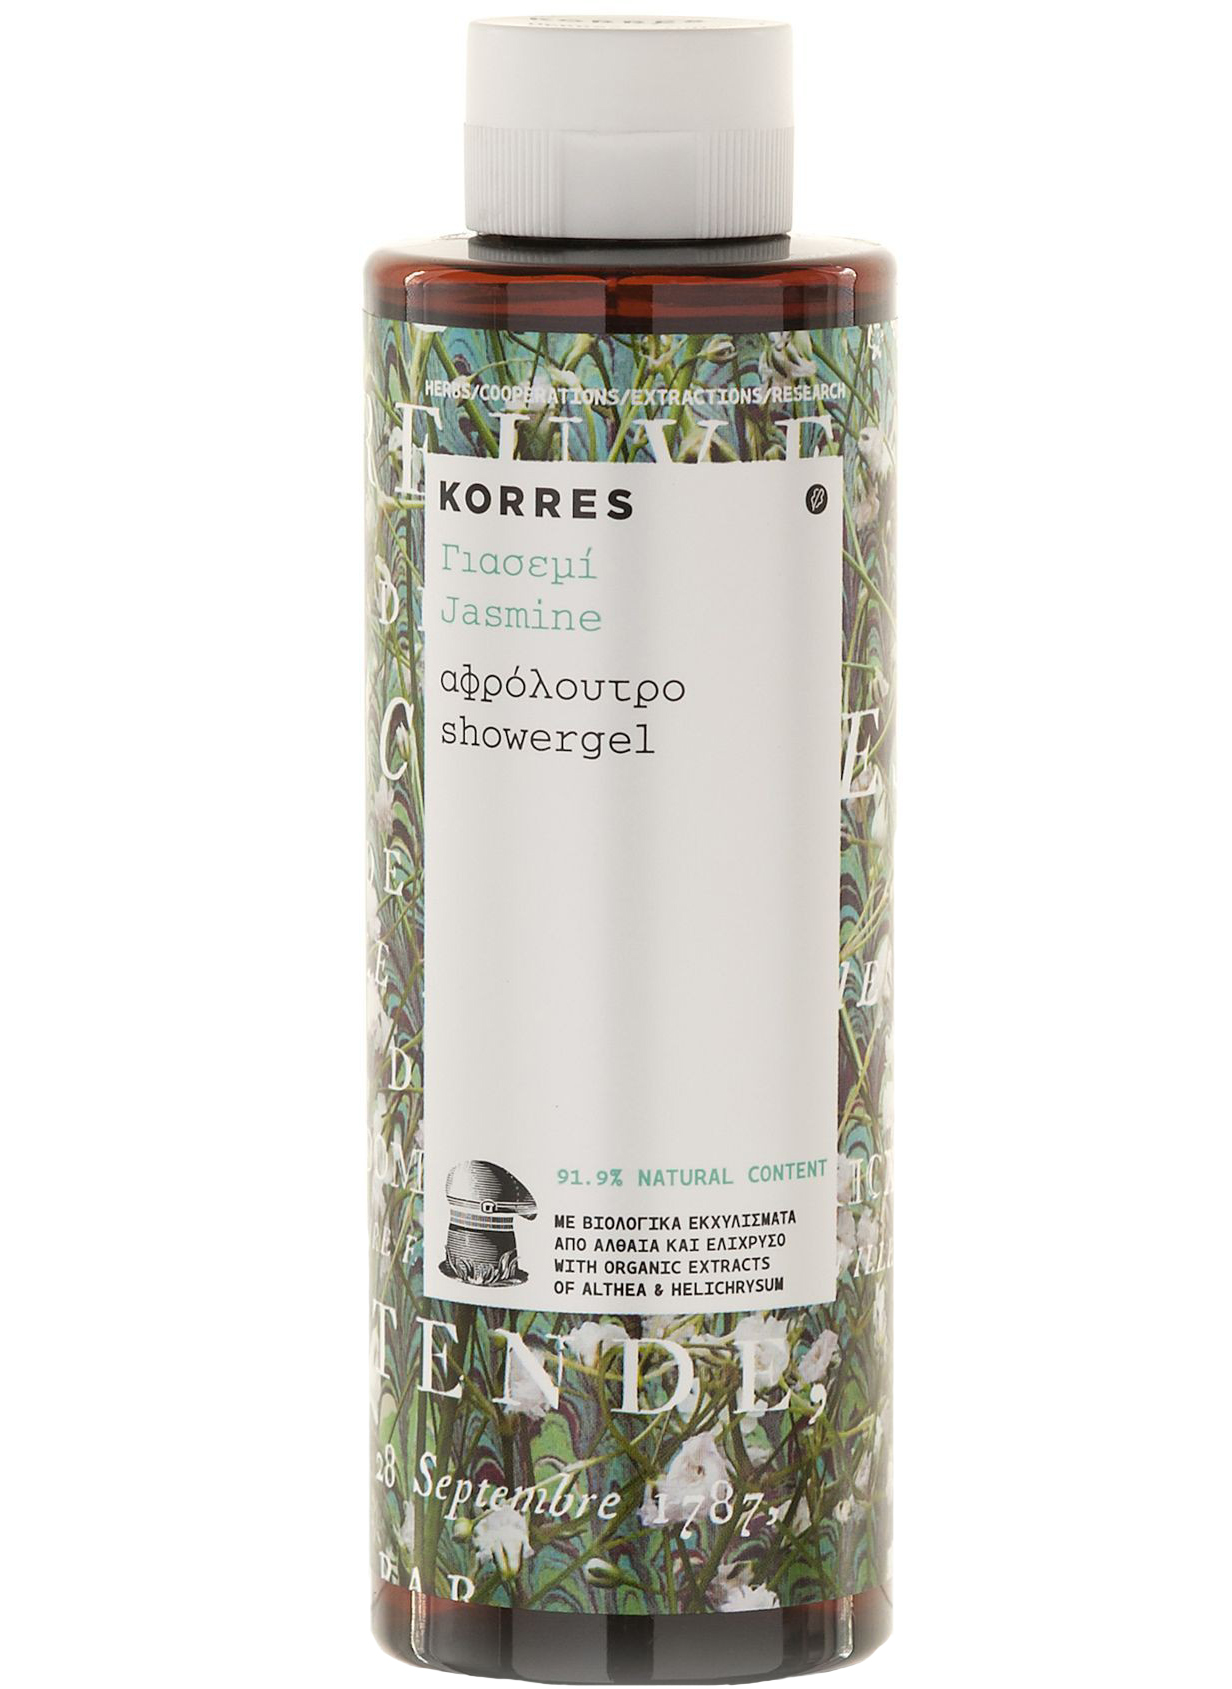 Korres Γιασεμί Αφρόλουτρο Με Μεθυστικό Αρωμα Από Ανθη Γιασεμιού 250ml